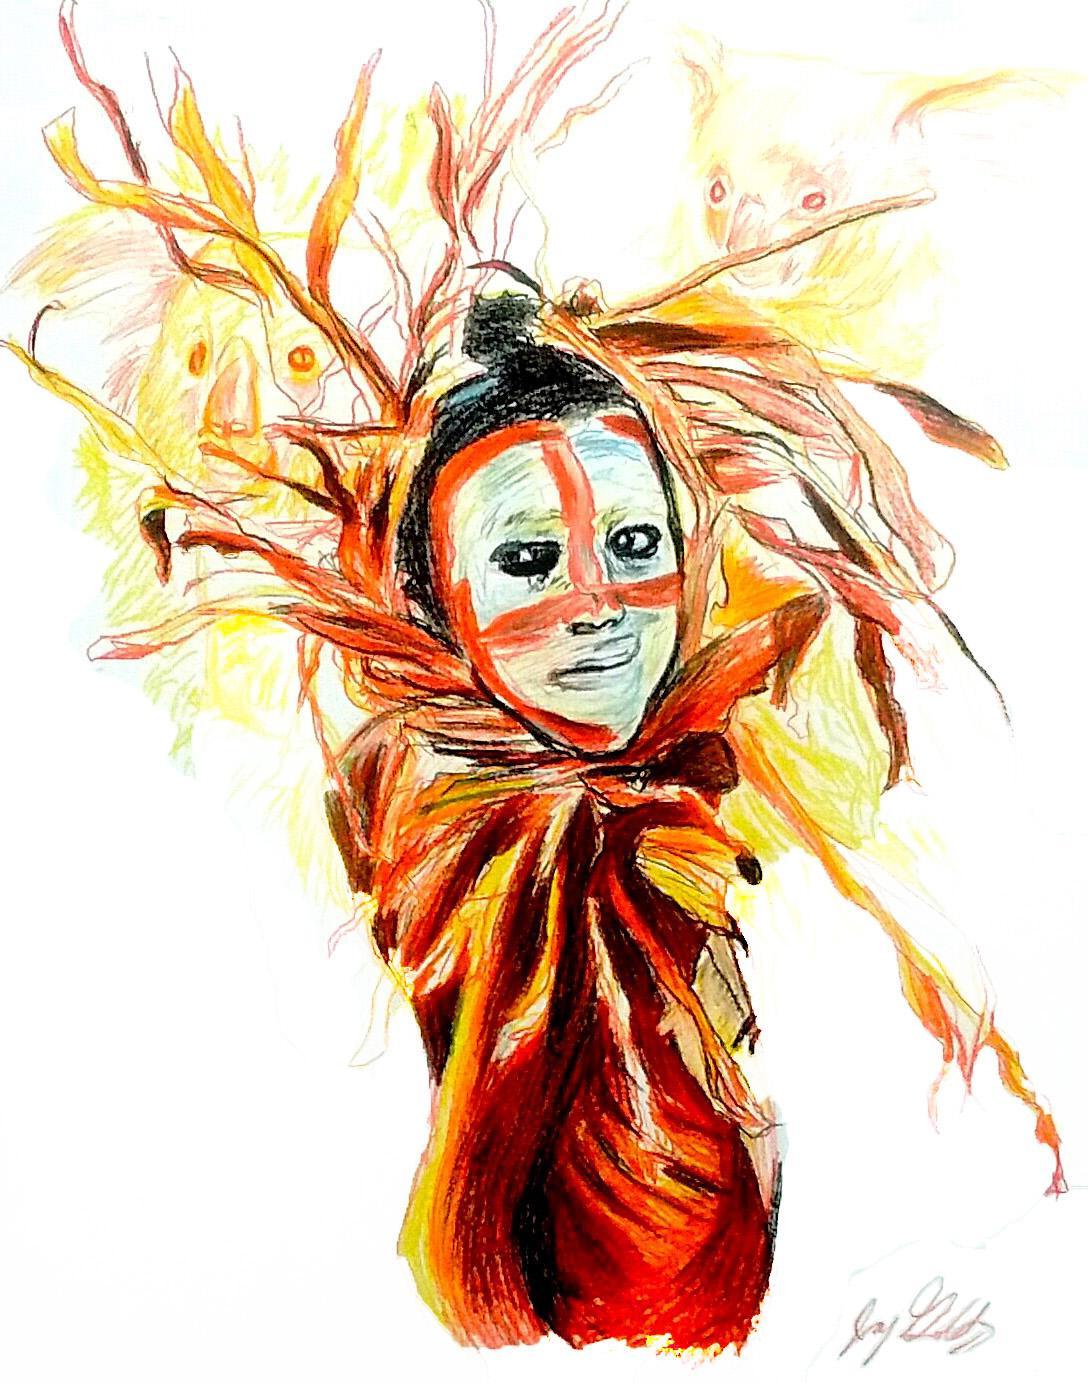 Fire (Koala Spirit), 2017, figurative, yellow, orange, drawing, tribal, MarYah